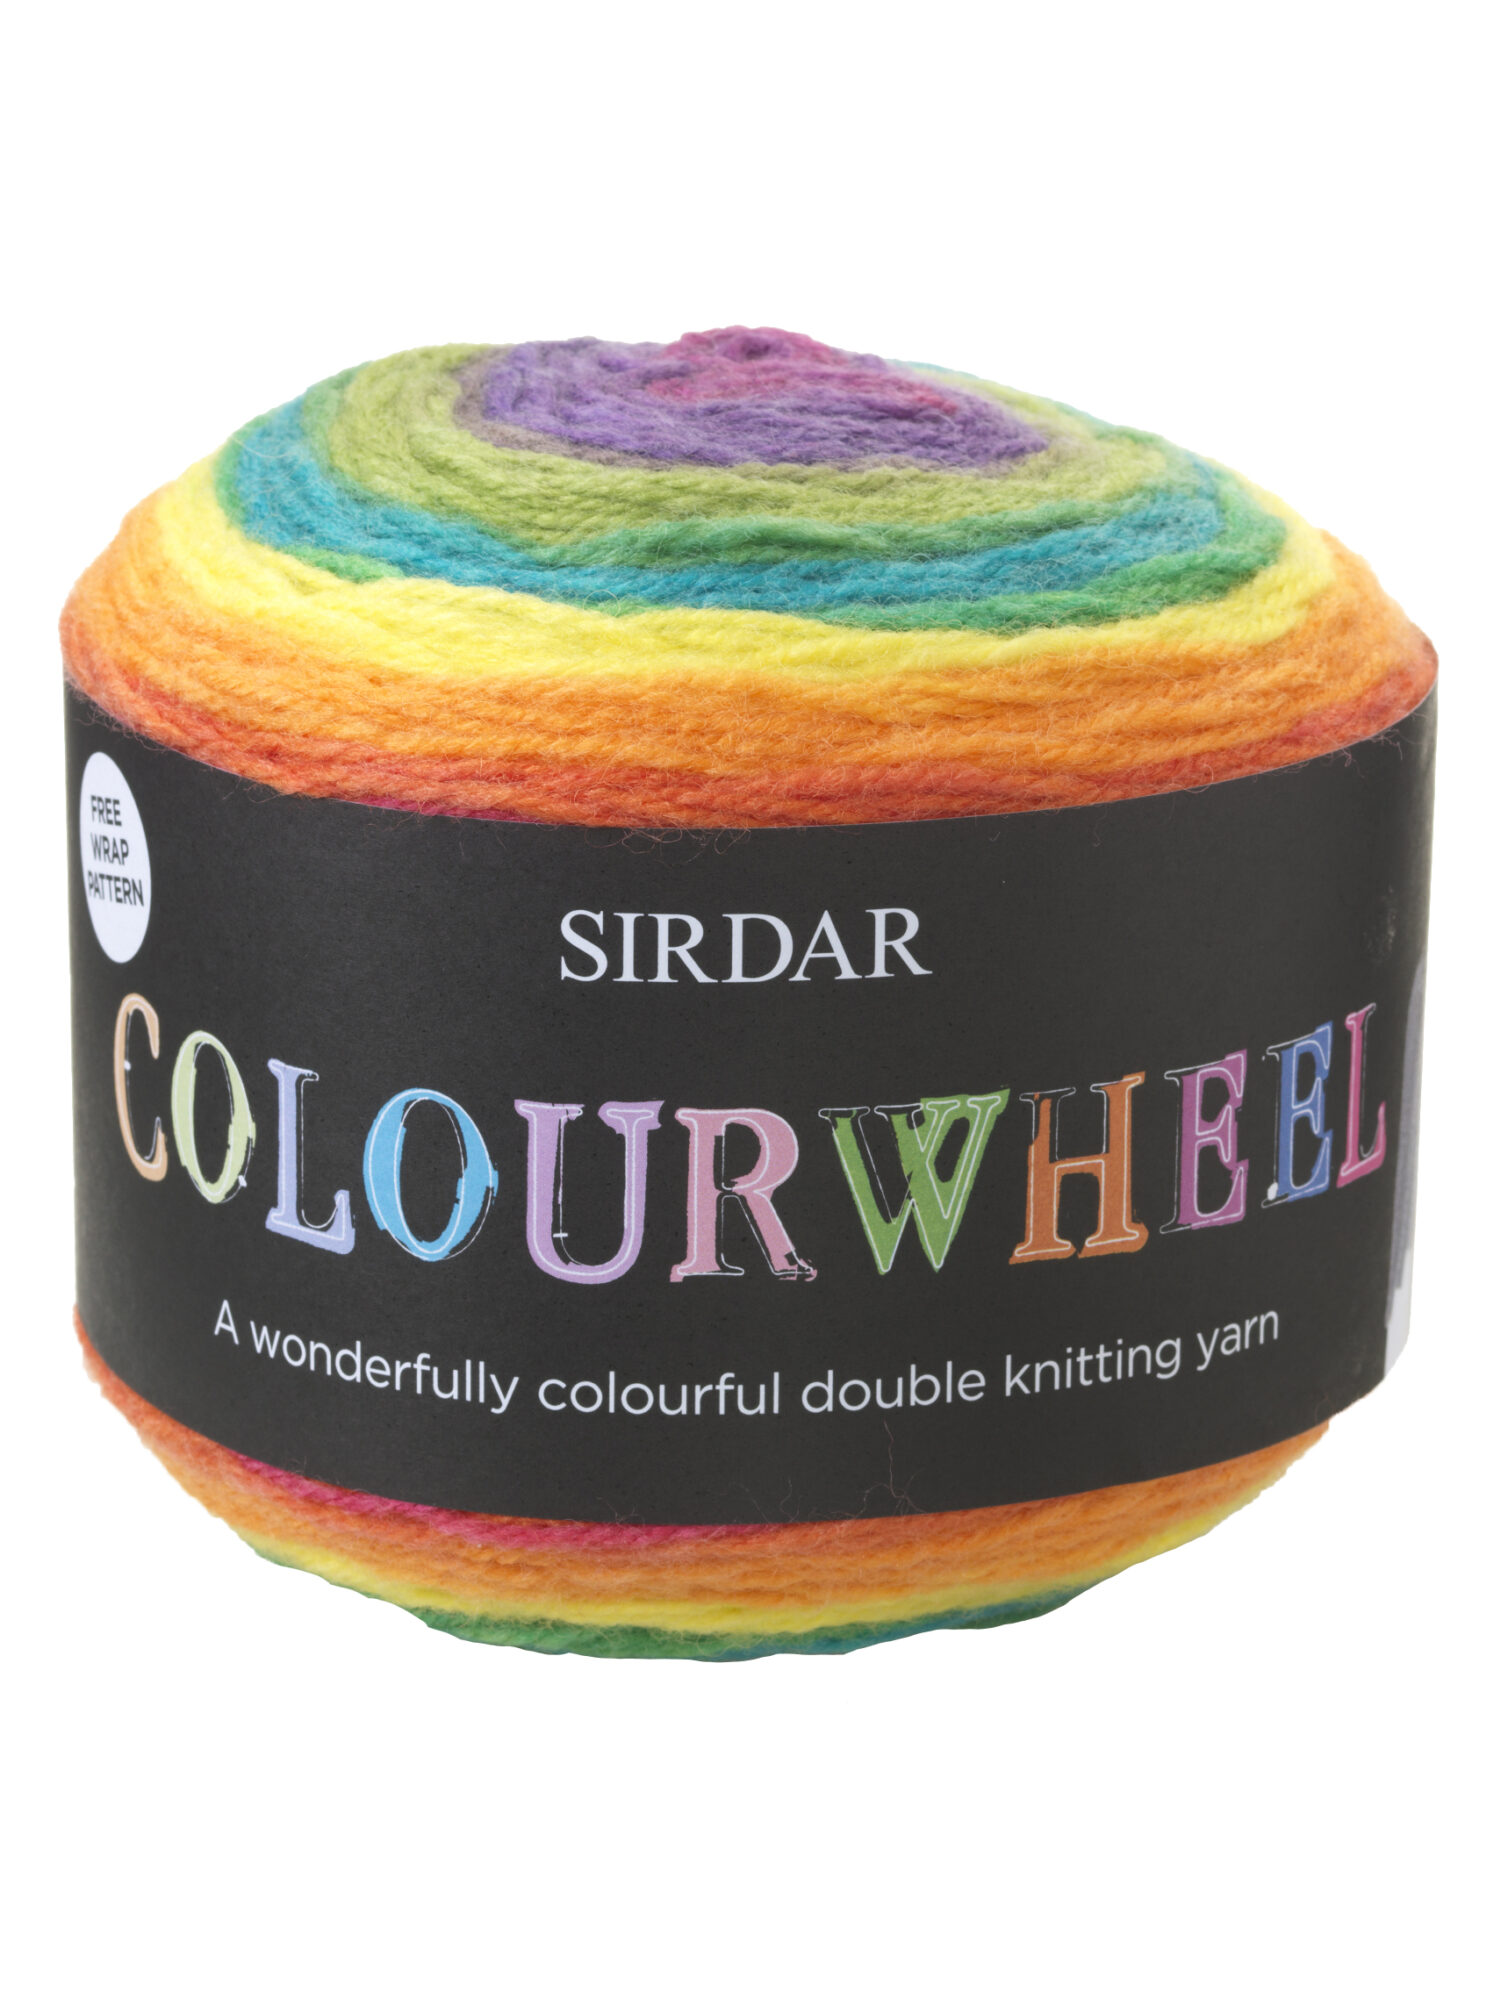 Sirdar Colourwheel product image